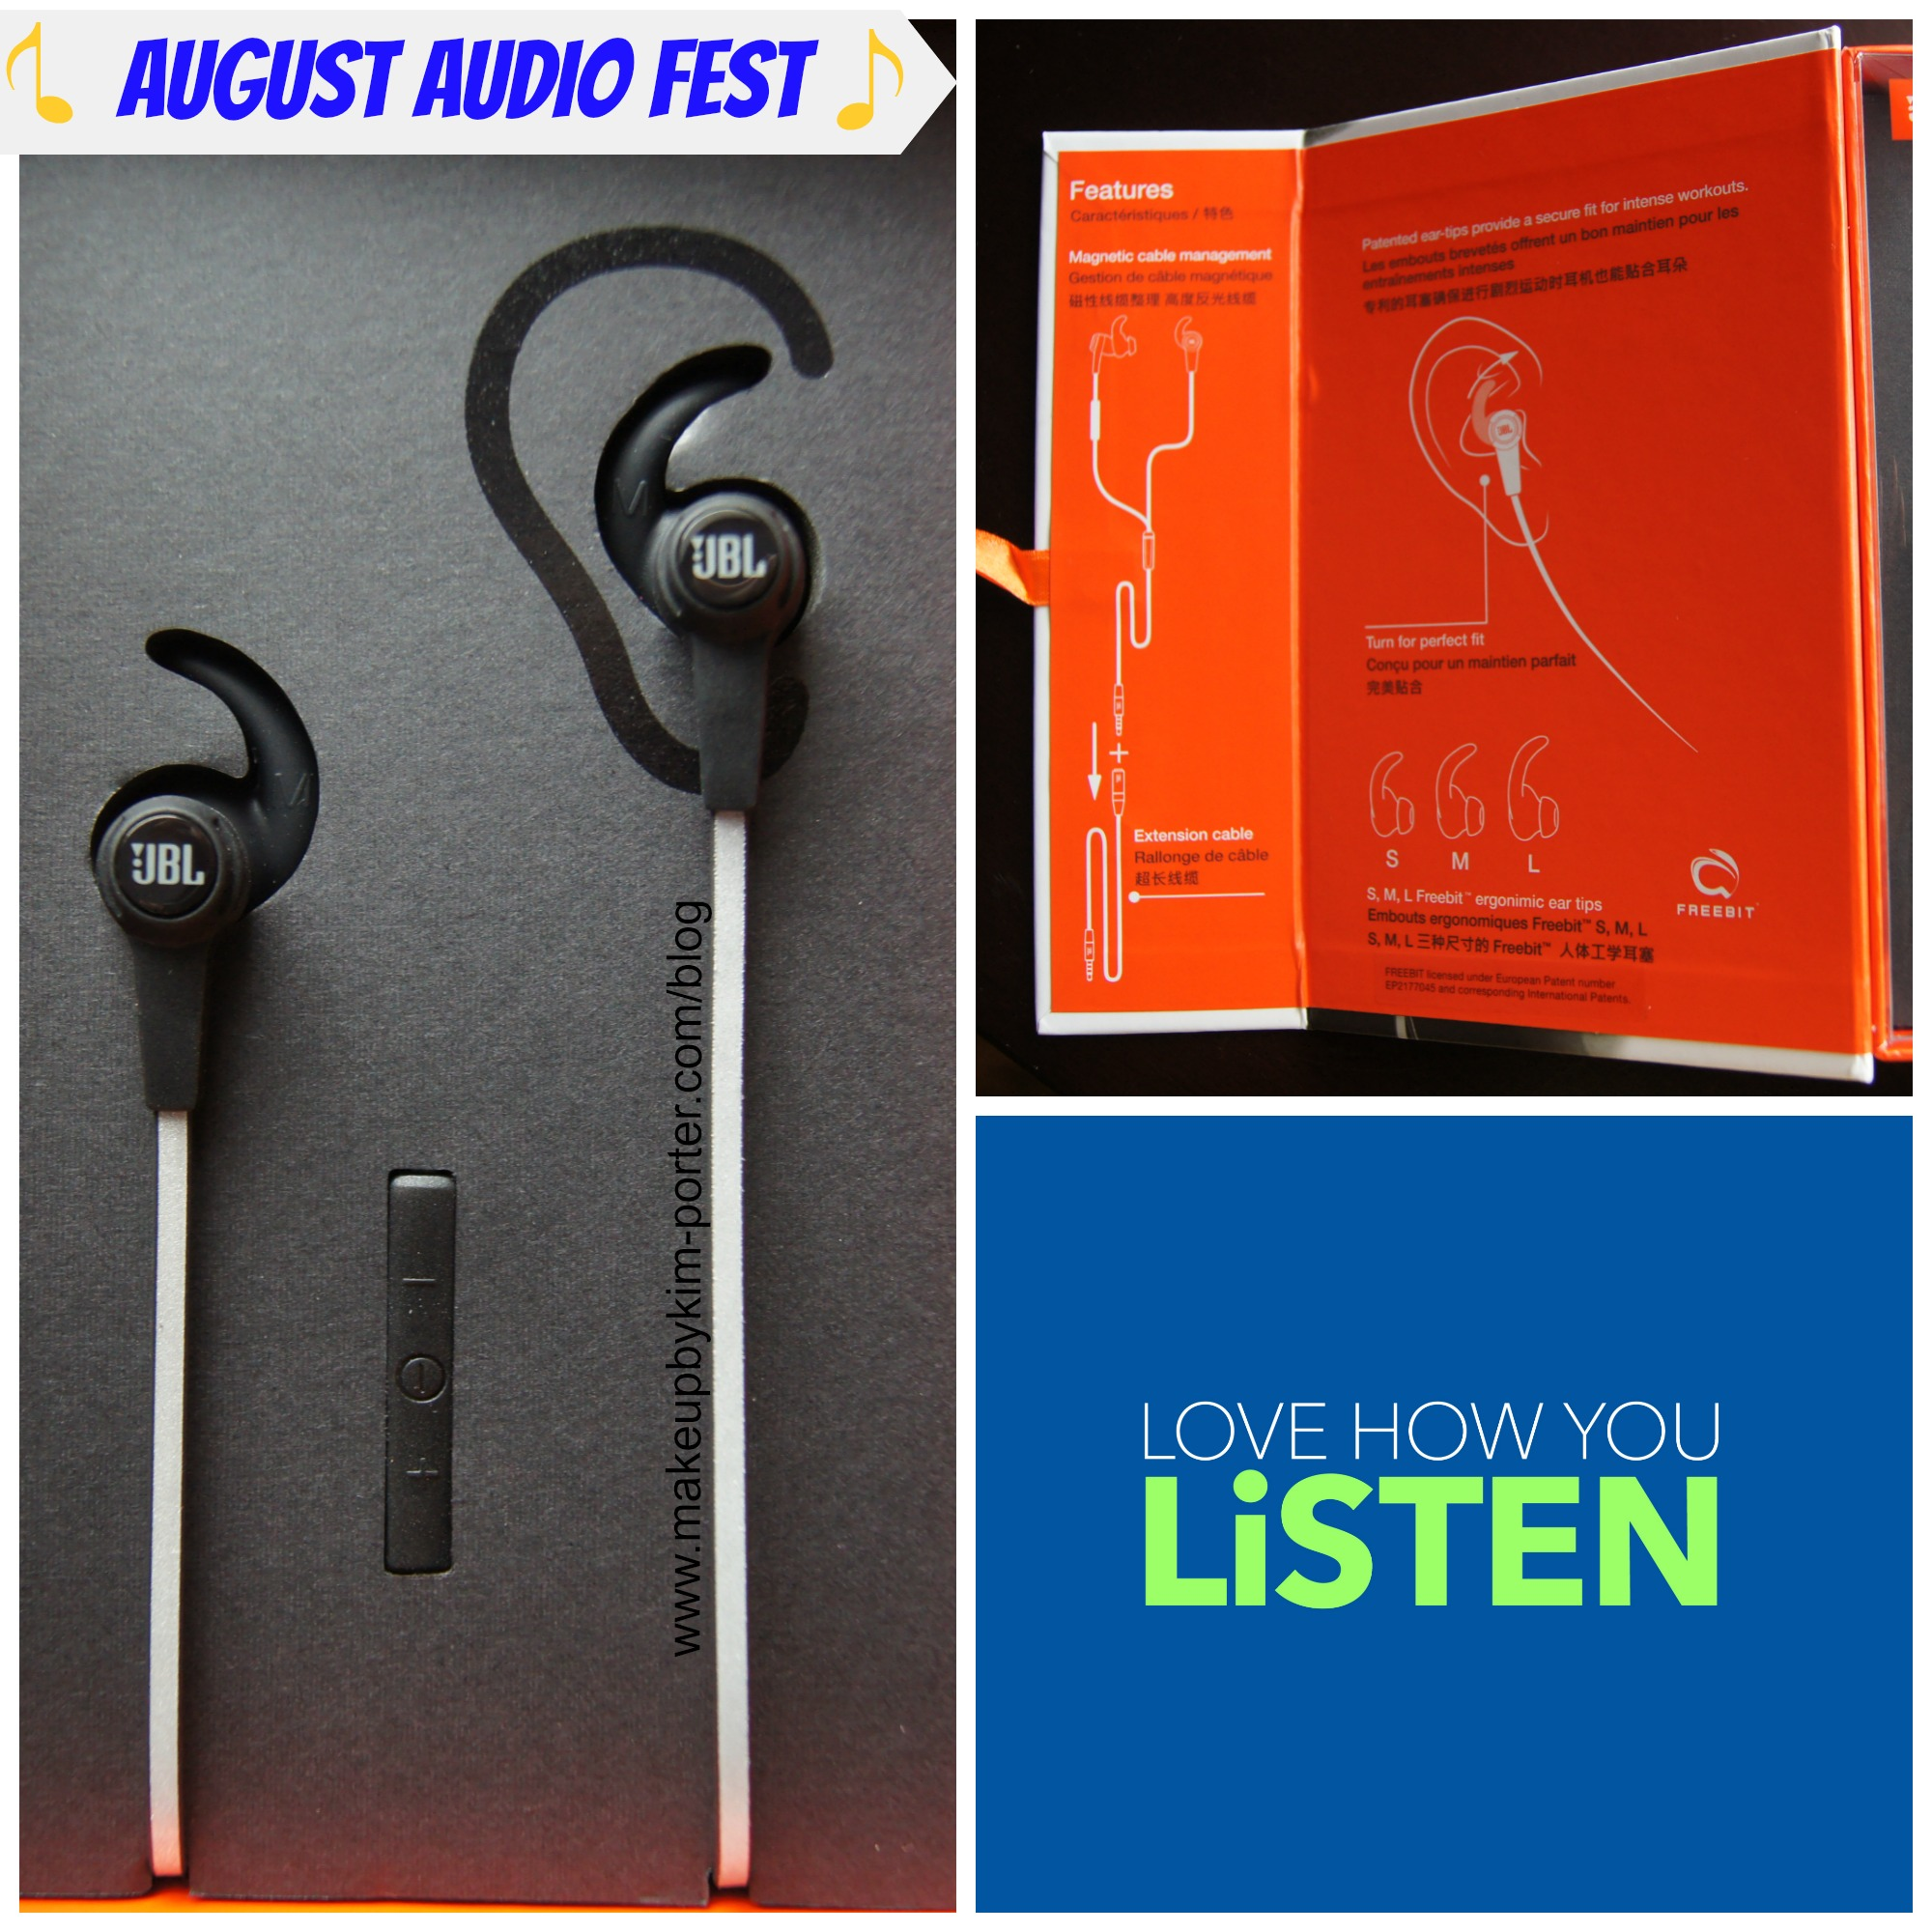 49b1f23adc9 August Audio Fest at Best Buy JBL Reflect Sport Headphones